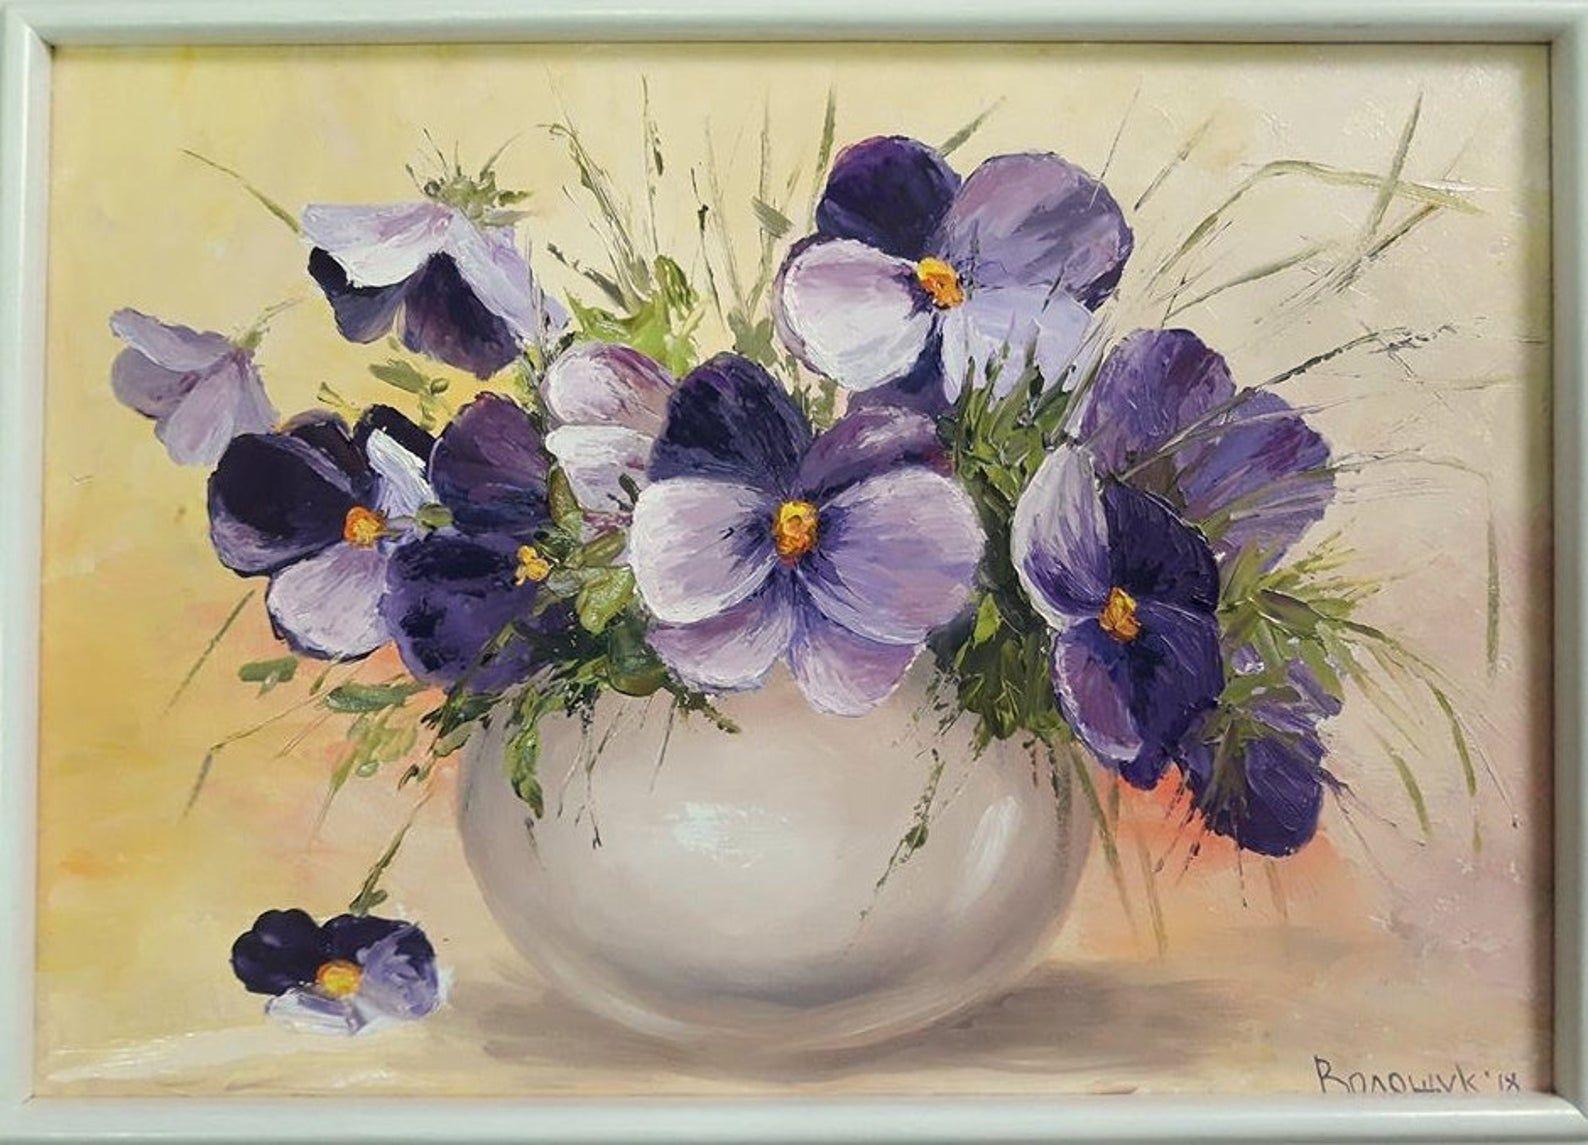 Bouquet Of Flowers Pansies Delicate Blue And Purple Flowers Etsy In 2020 Pansies Flowers Watercolor Flowers Blue And Purple Flowers